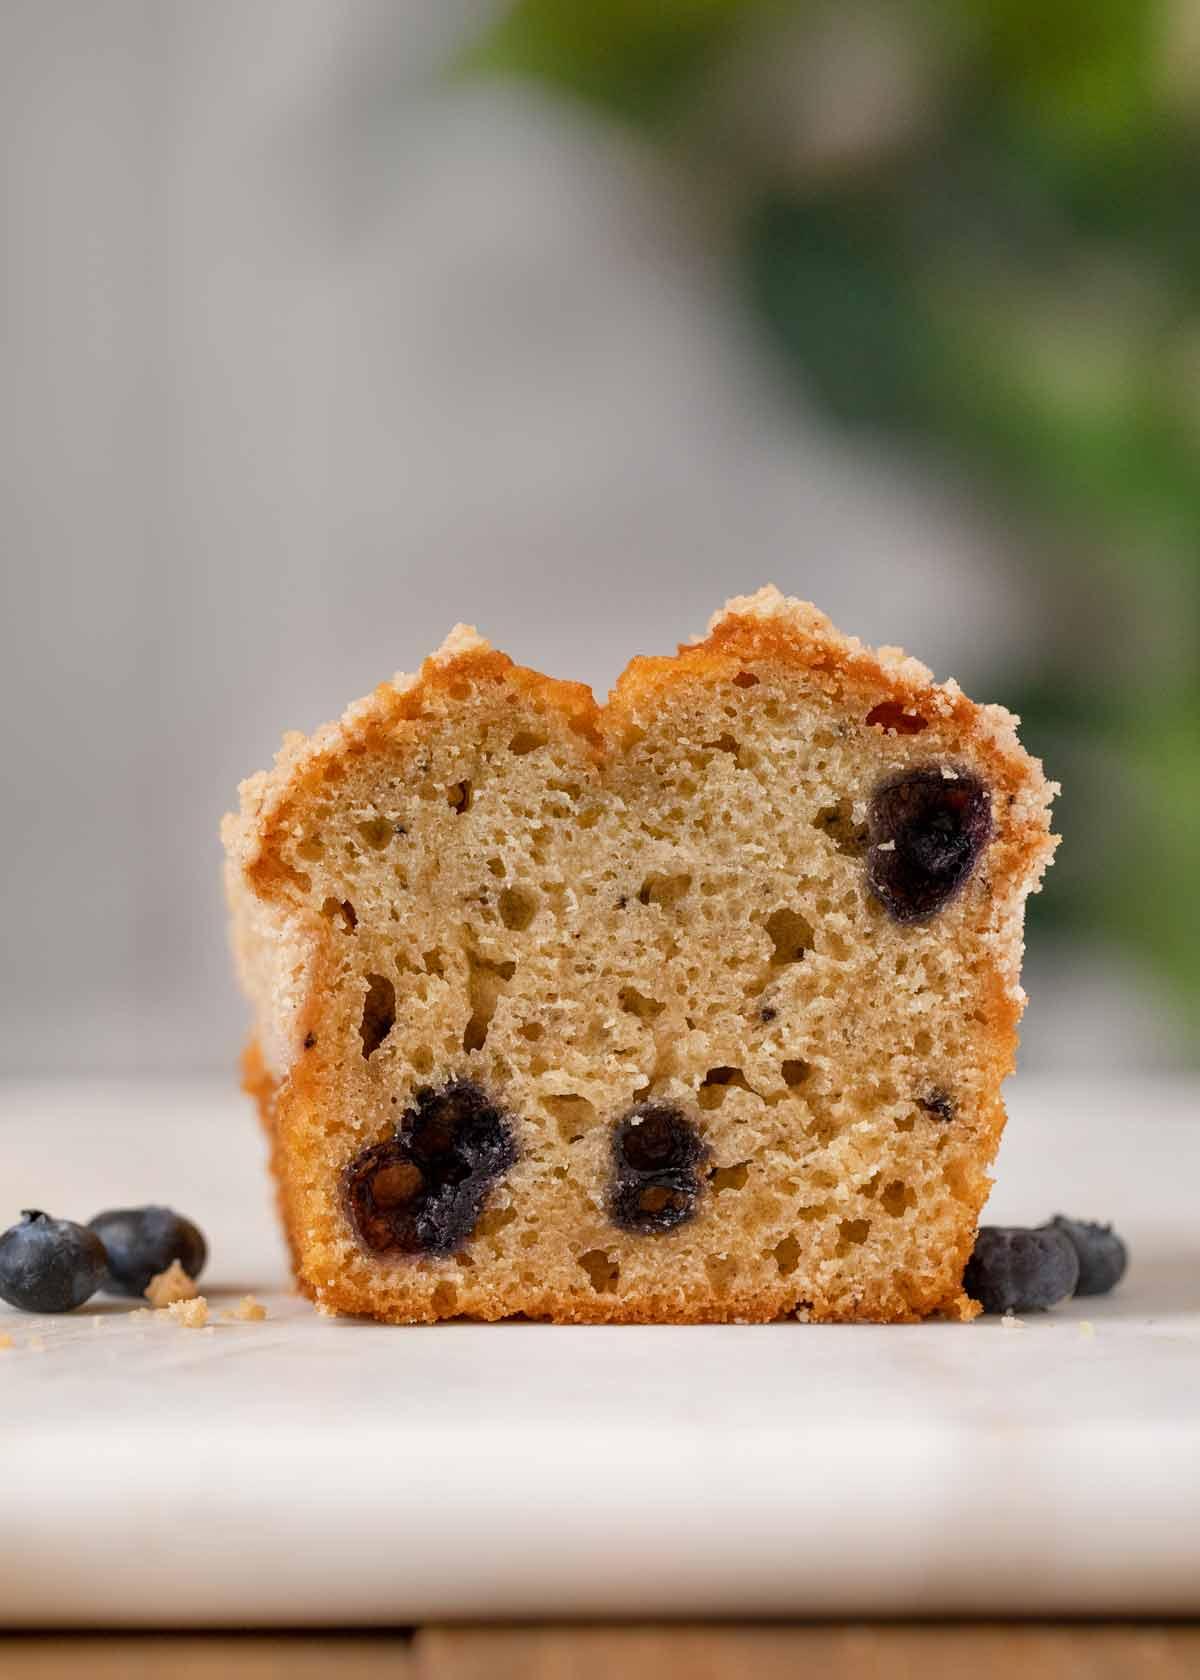 Blueberry Muffin Bread Recipe - Dinner, then Dessert